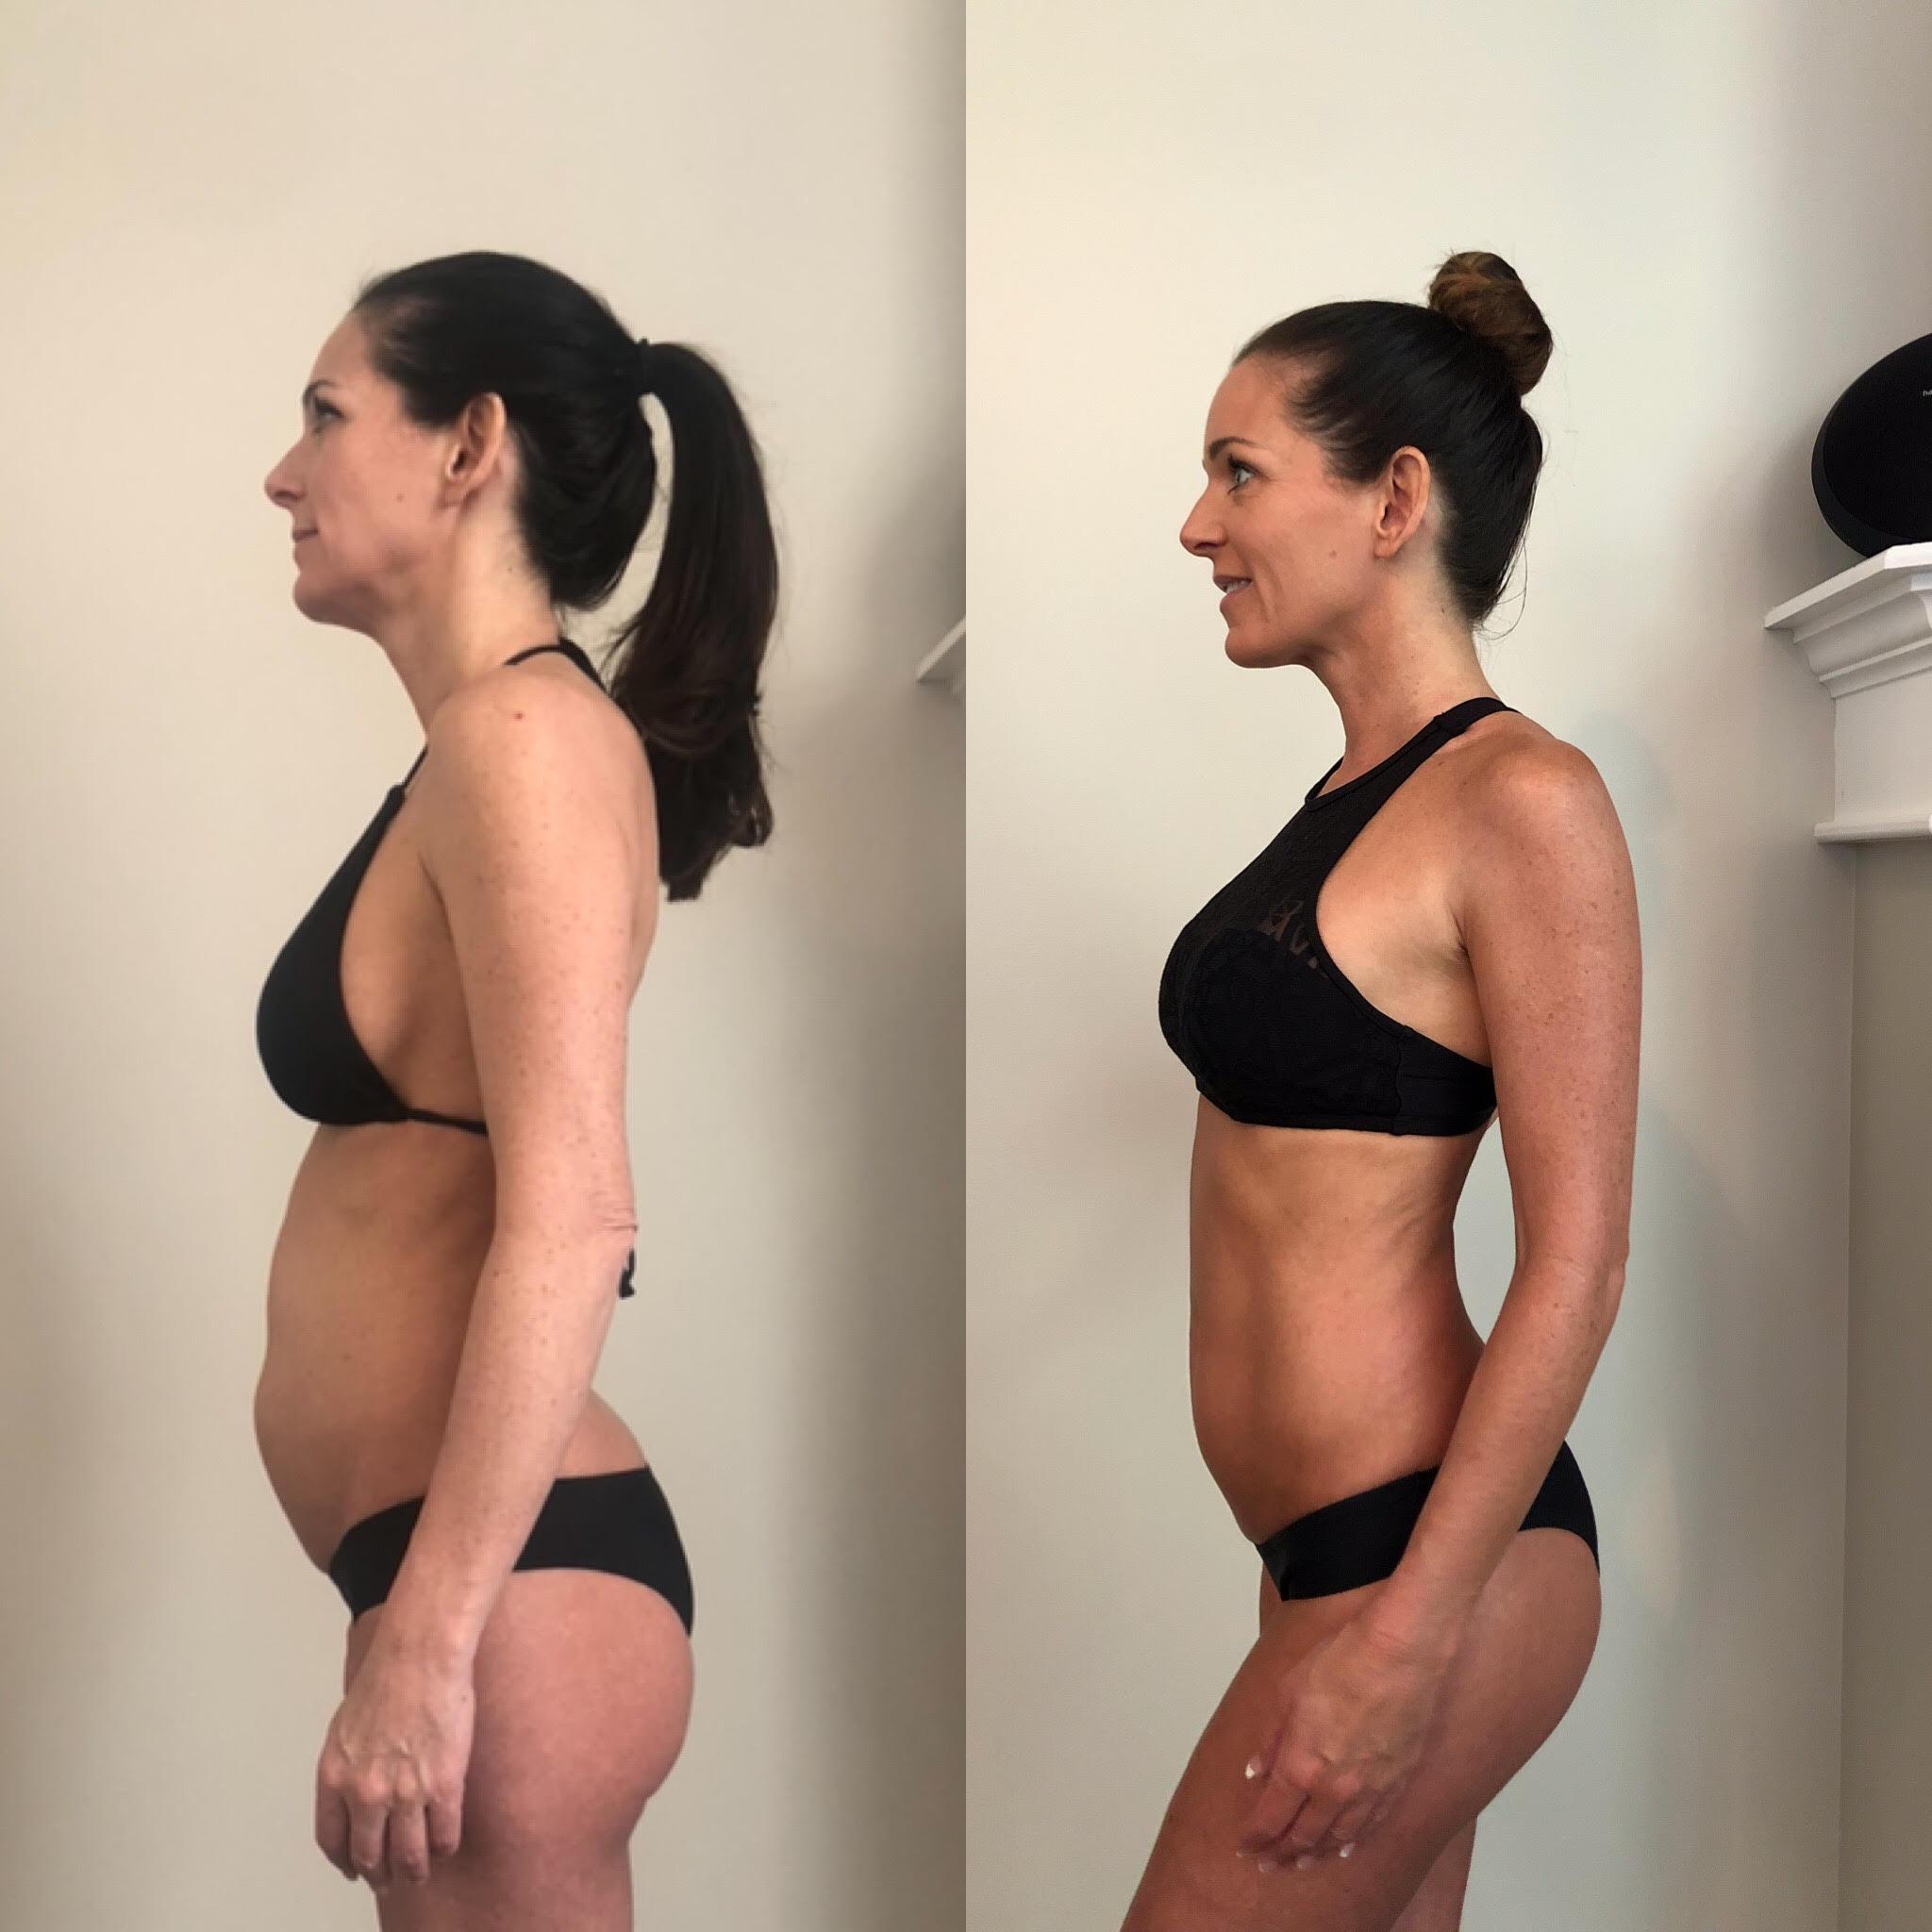 28-day-challenge transformation